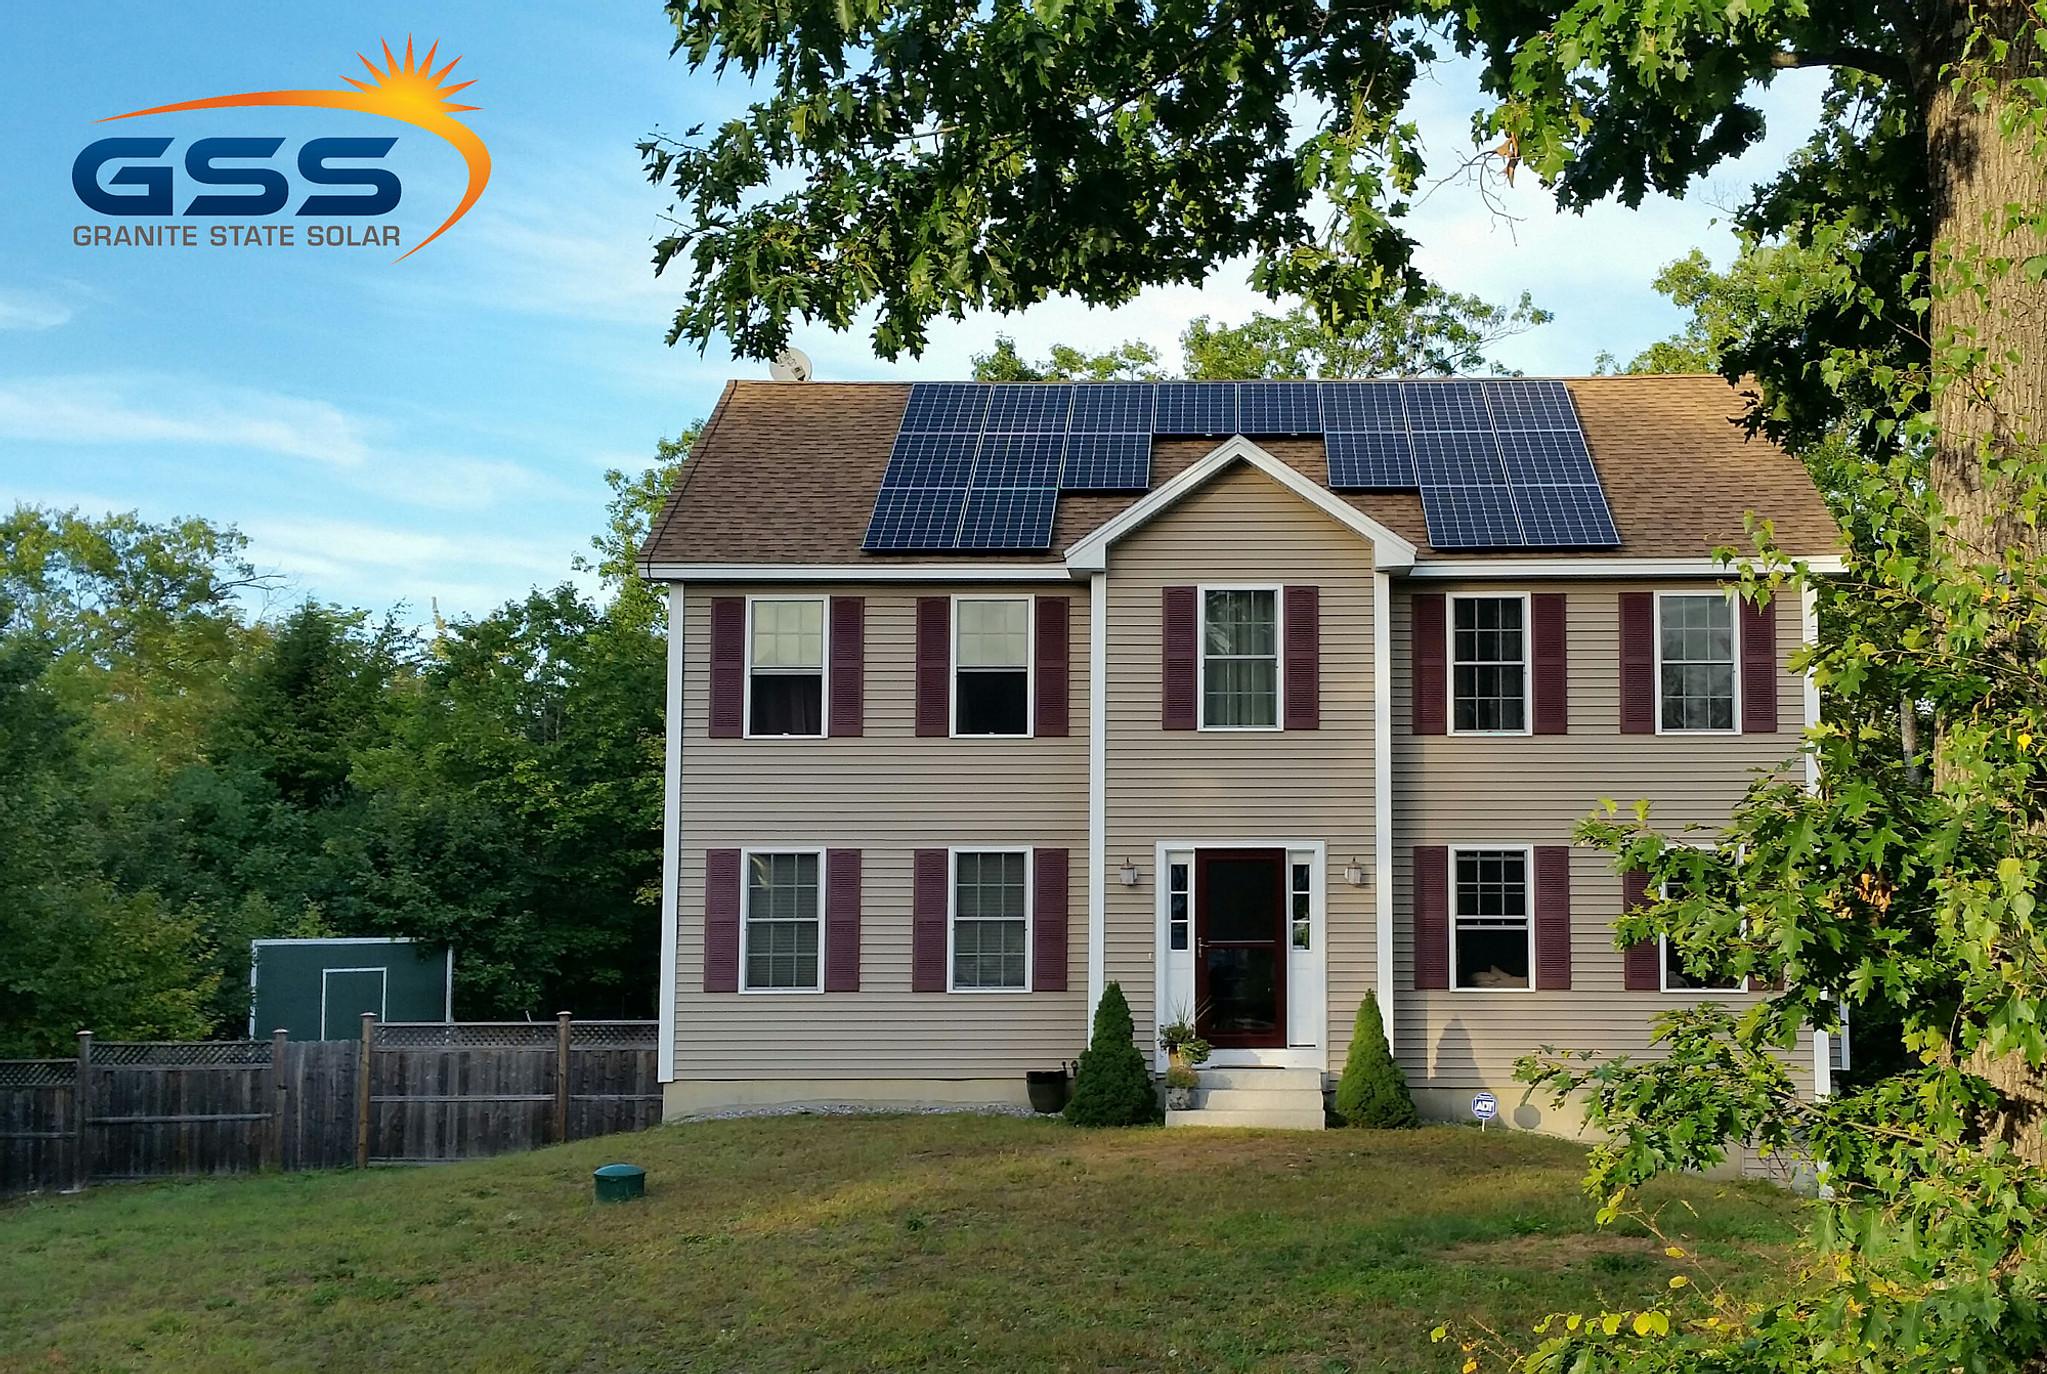 18 solar panel roof array